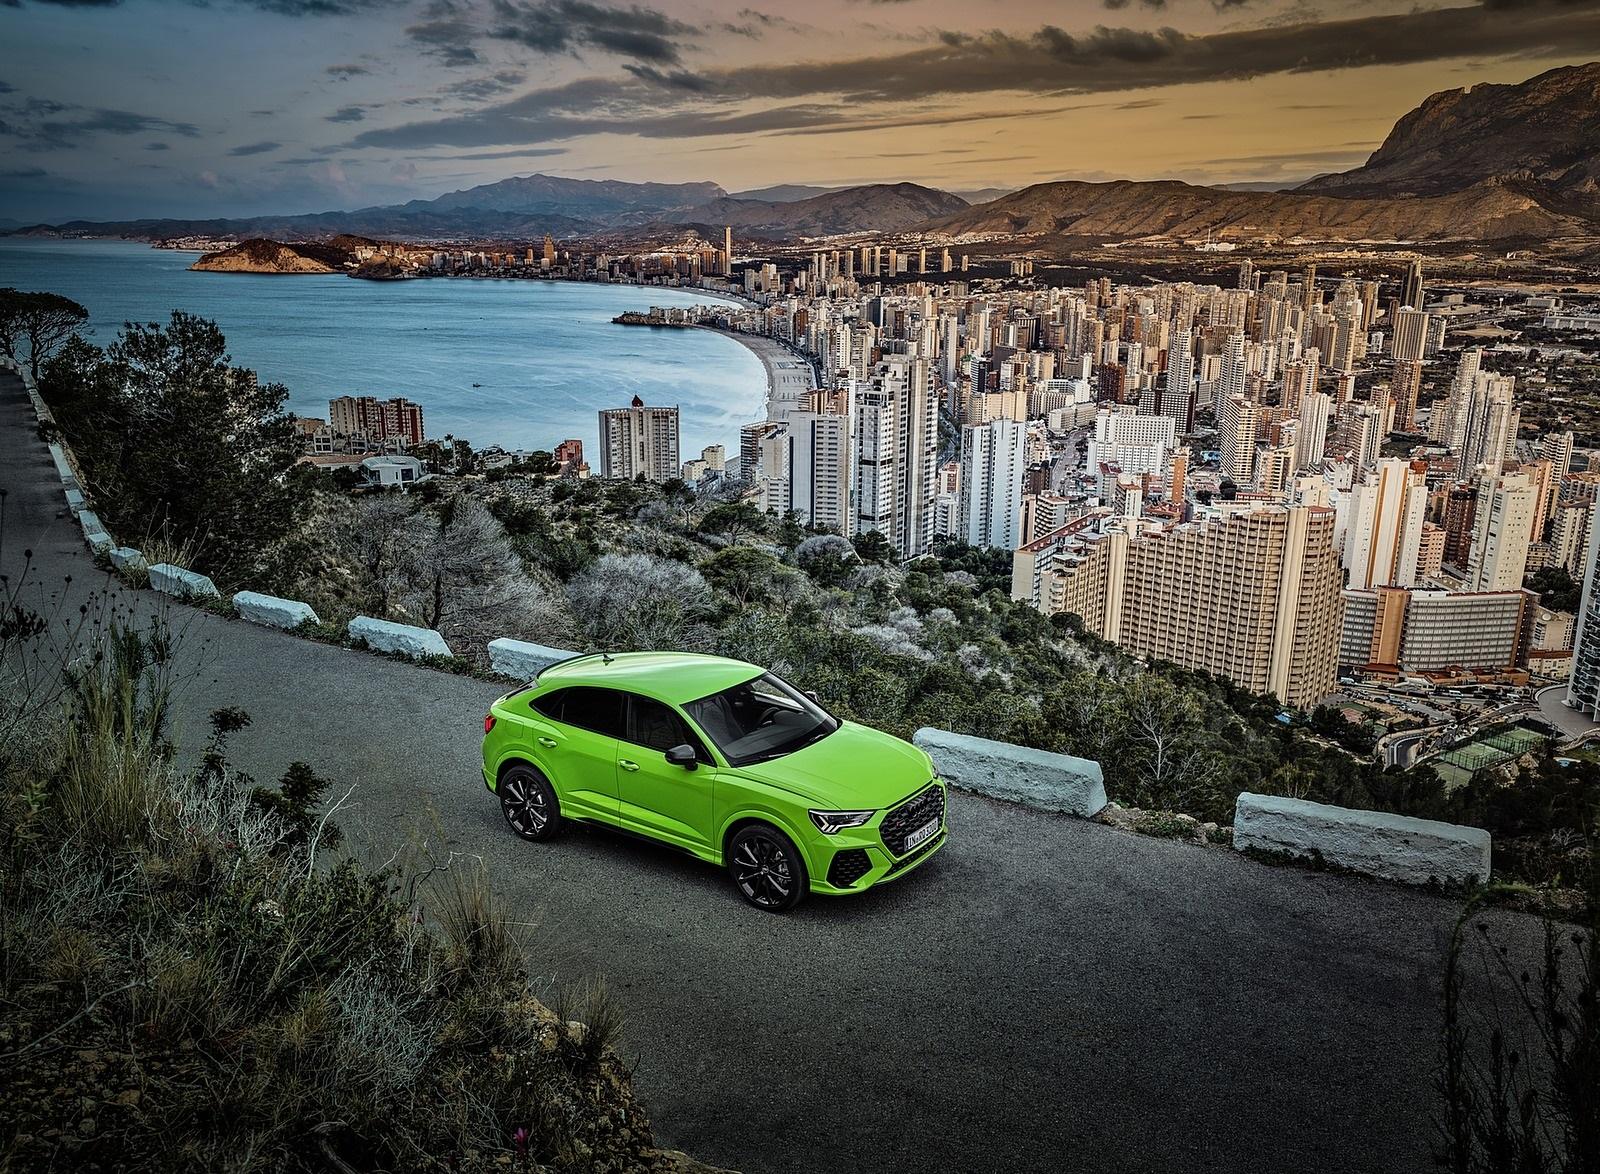 2020 Audi RS Q3 Sportback (Color: Kyalami Green) Front Three-Quarter Wallpapers (2)